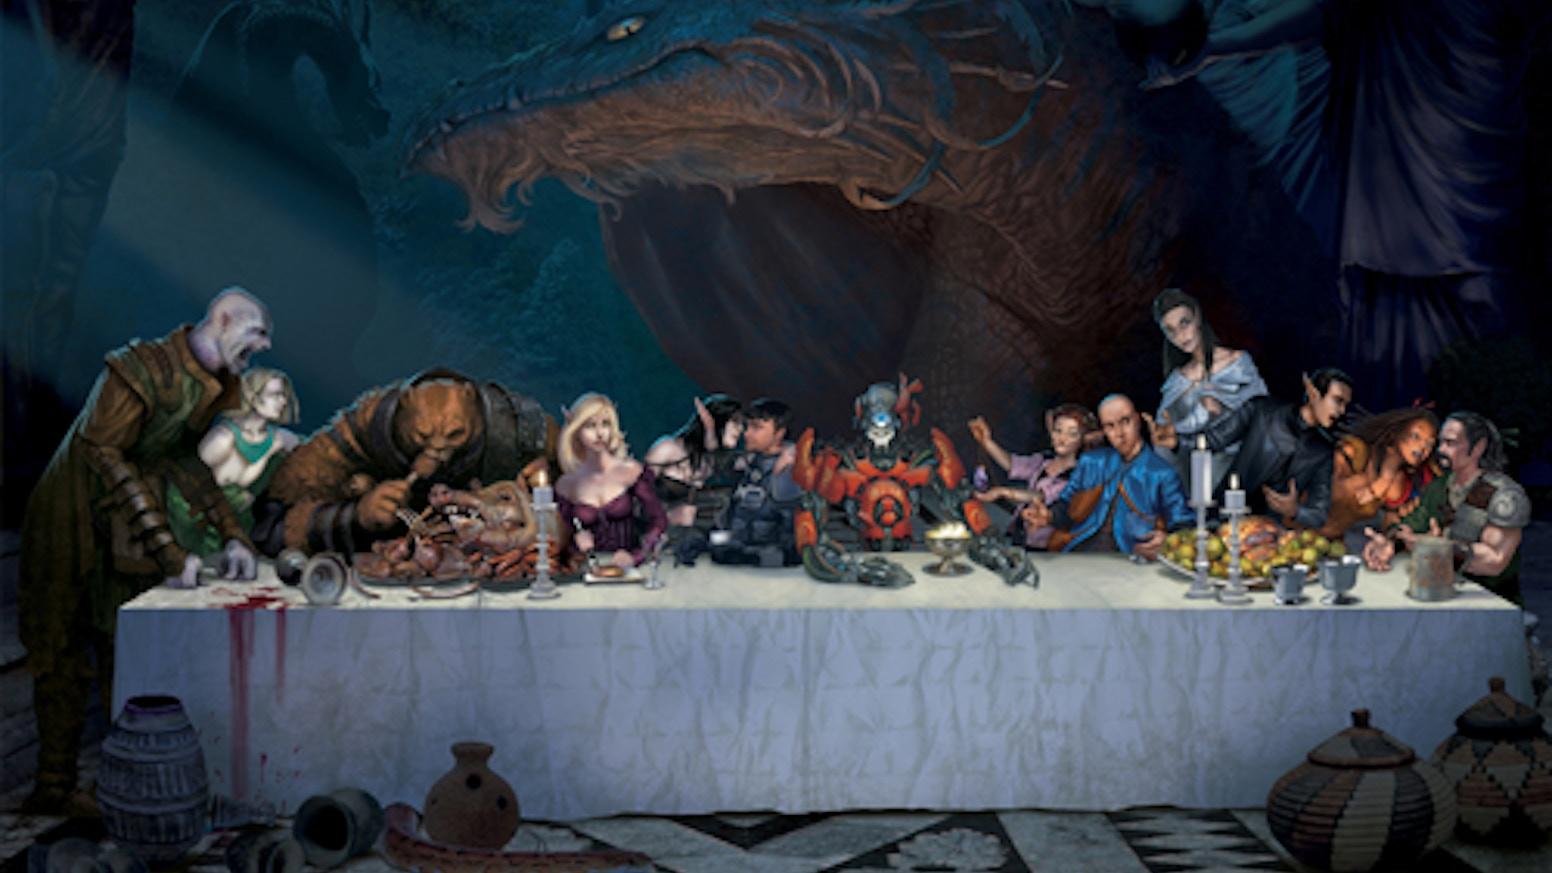 Amethyst - Fantasy & Technology Collide by Chris Dias